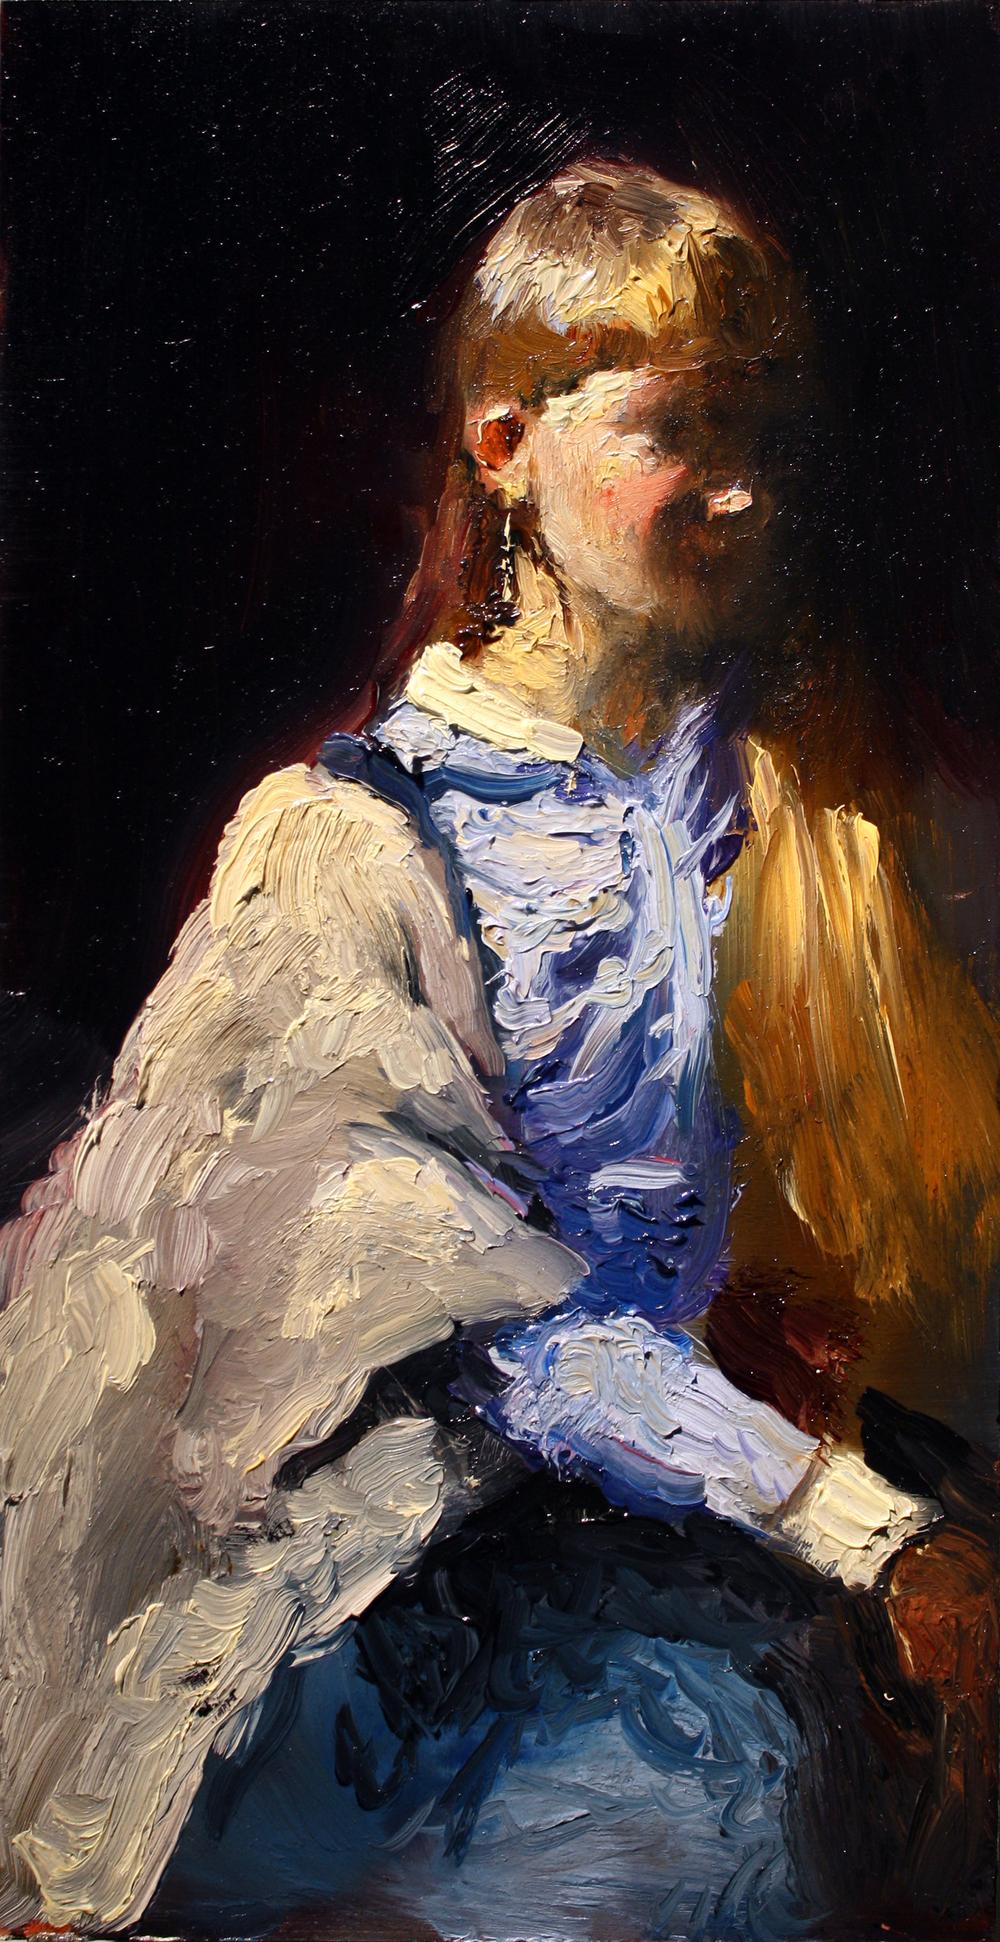 "Julia, oil on wood panel, 12"" x 6"" x 1"", 2017 (sold)"